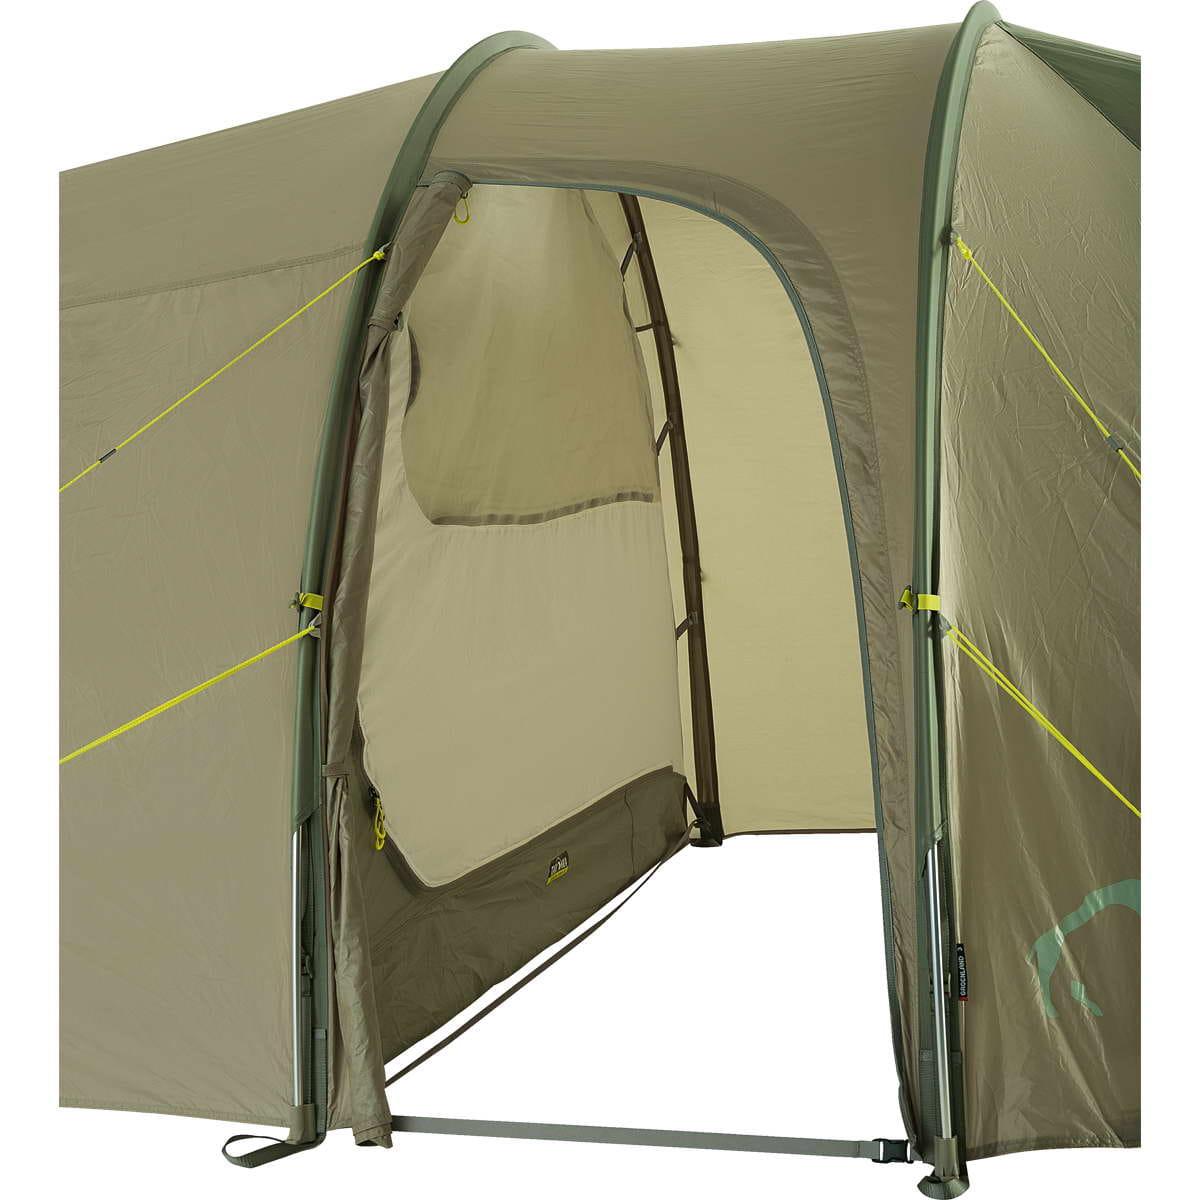 Tatonka Grönland 3 - Drei-Personen-Zelt - Bild 7